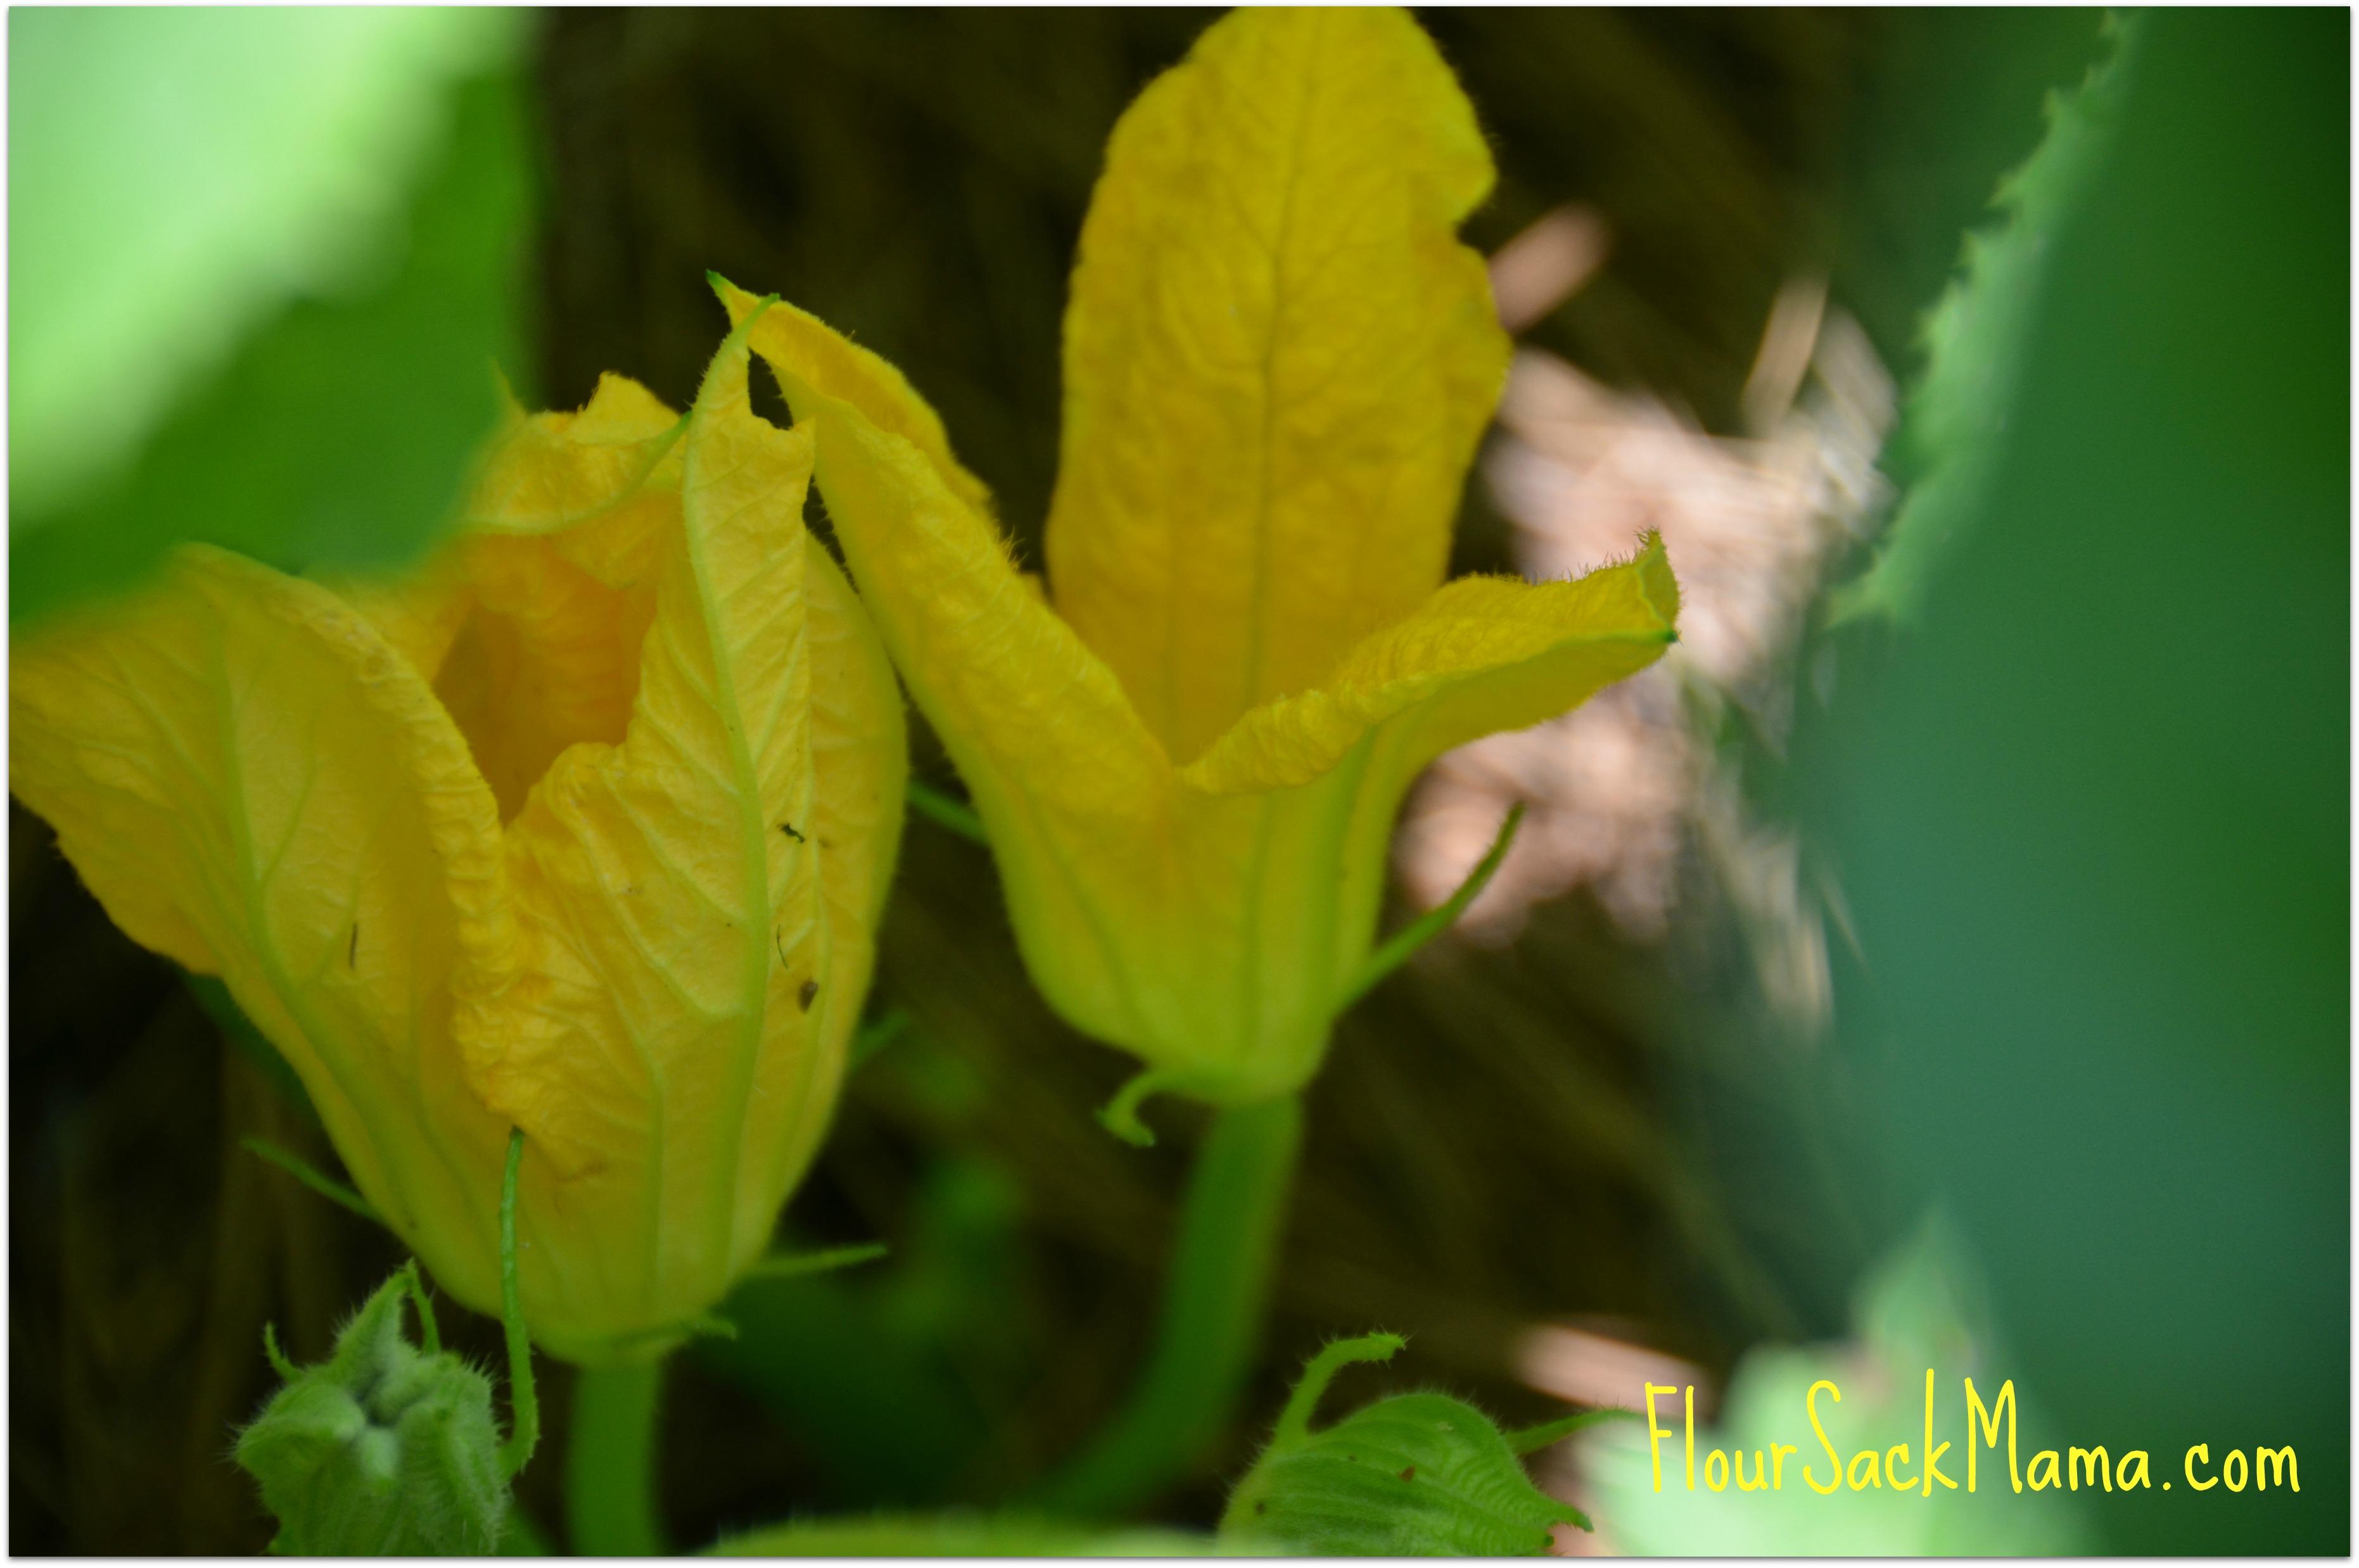 Squash Blooms Organic Garden Flour Sack Mama